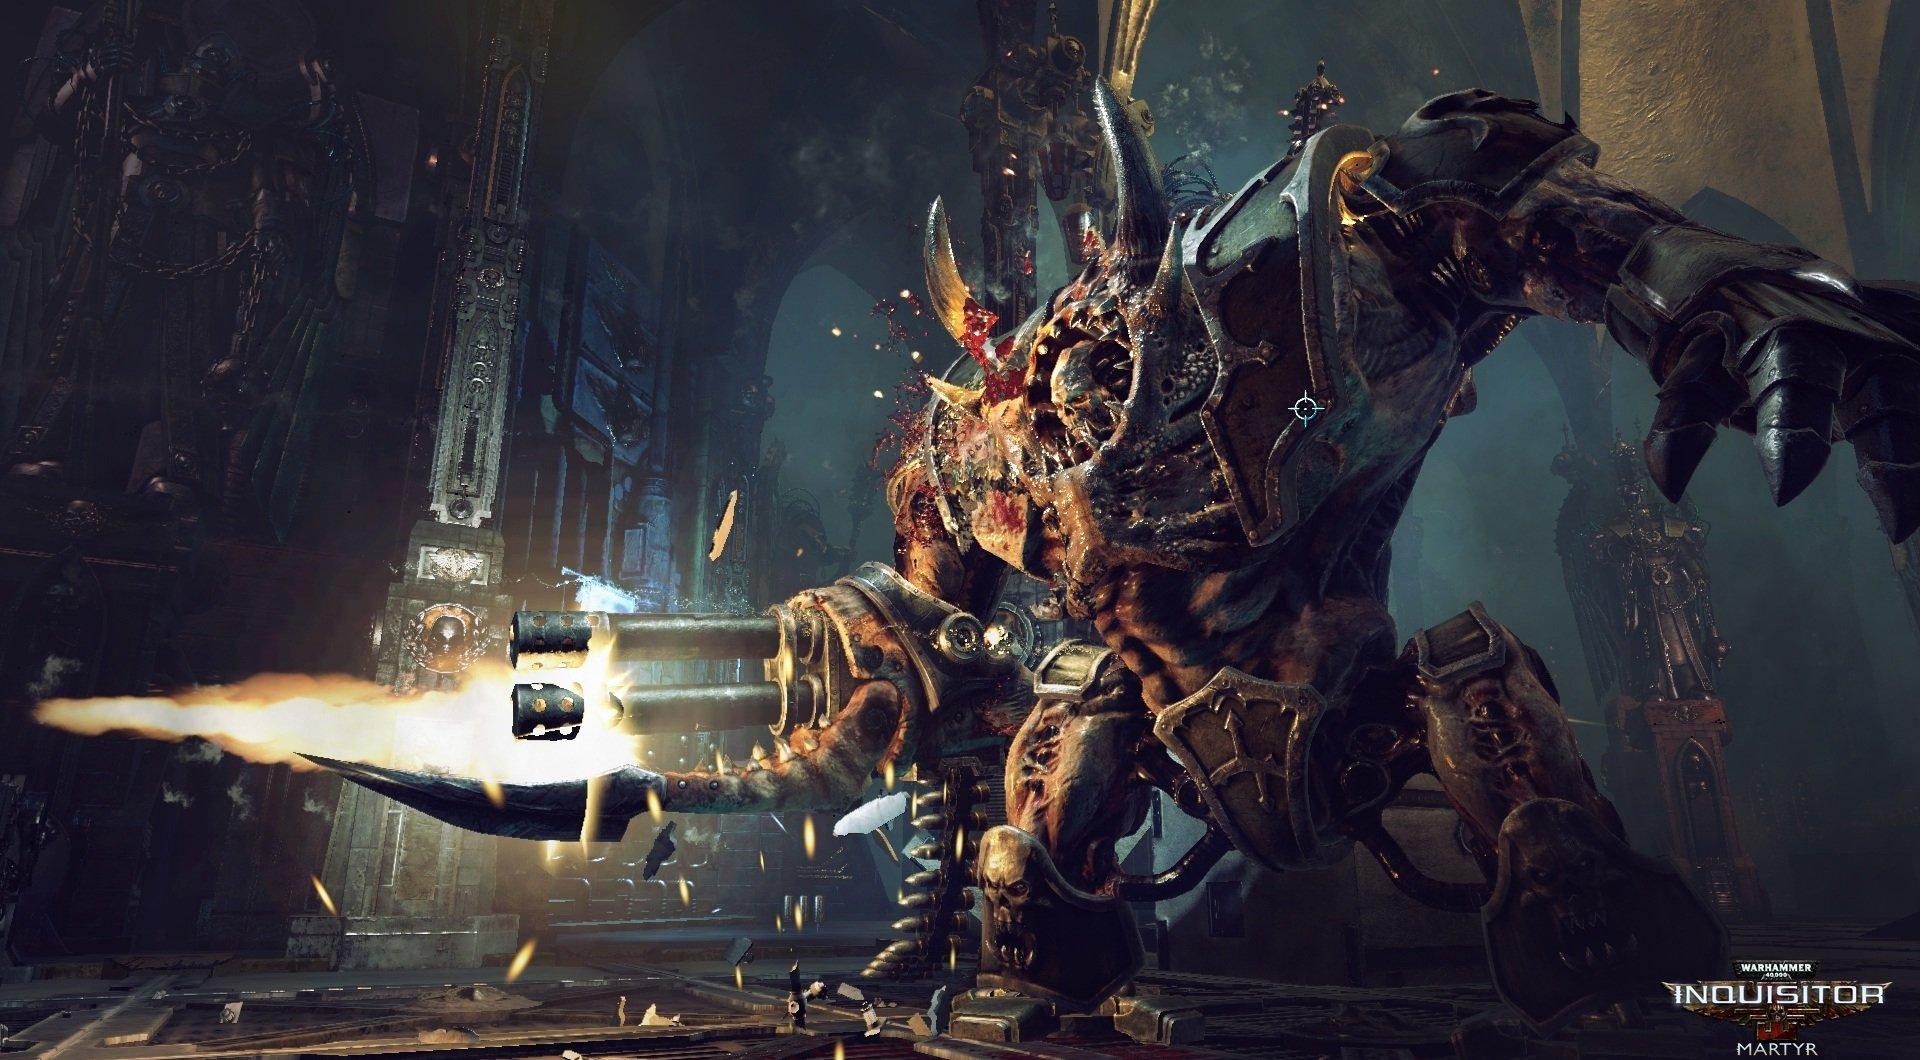 [PC] Немного об альфа-билде Warhammer 40,000: Inquisitor - Martyr. - Изображение 1